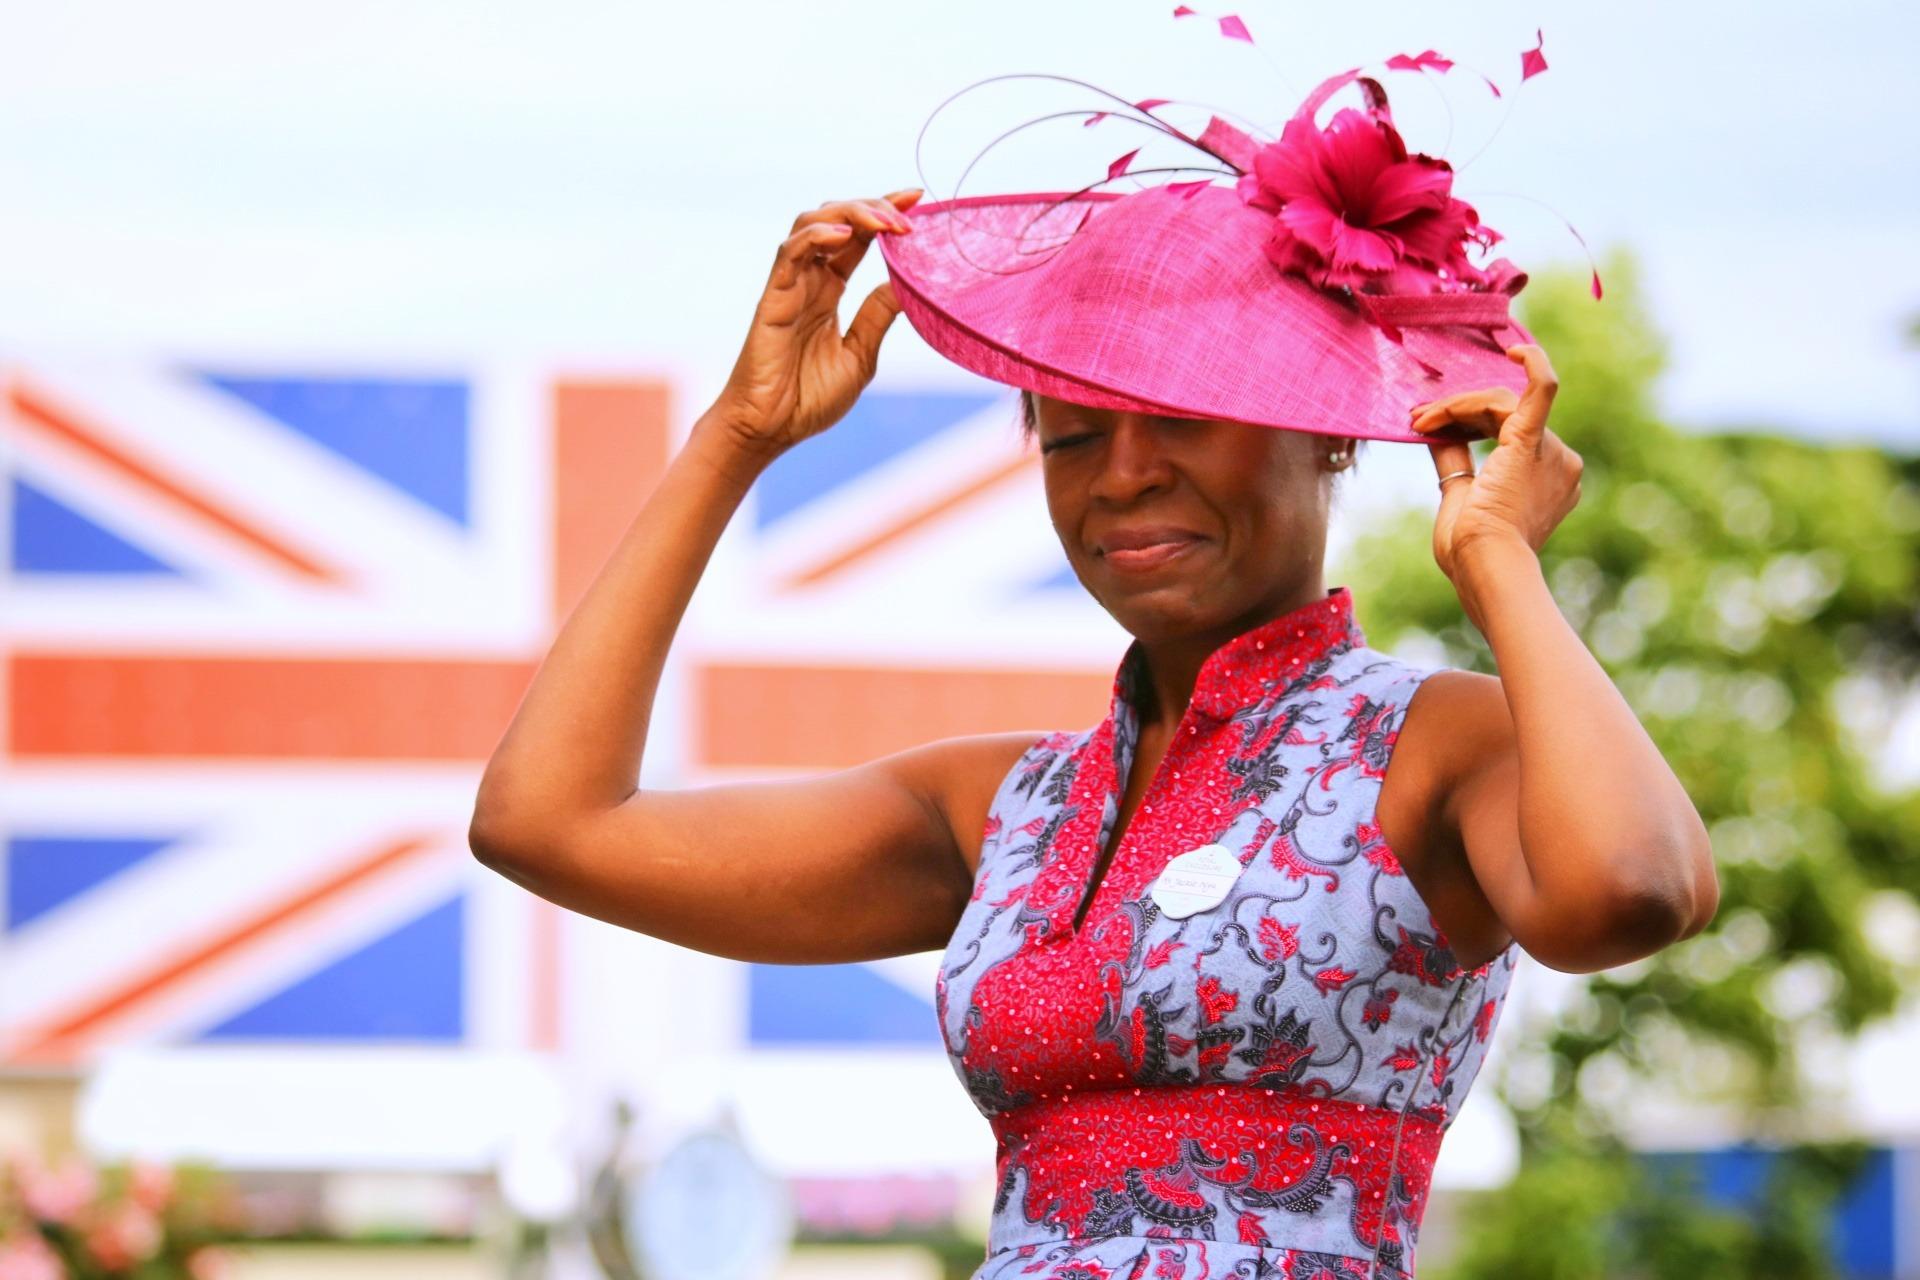 Royal Ascot 2019 Statement Hats and Fascinators